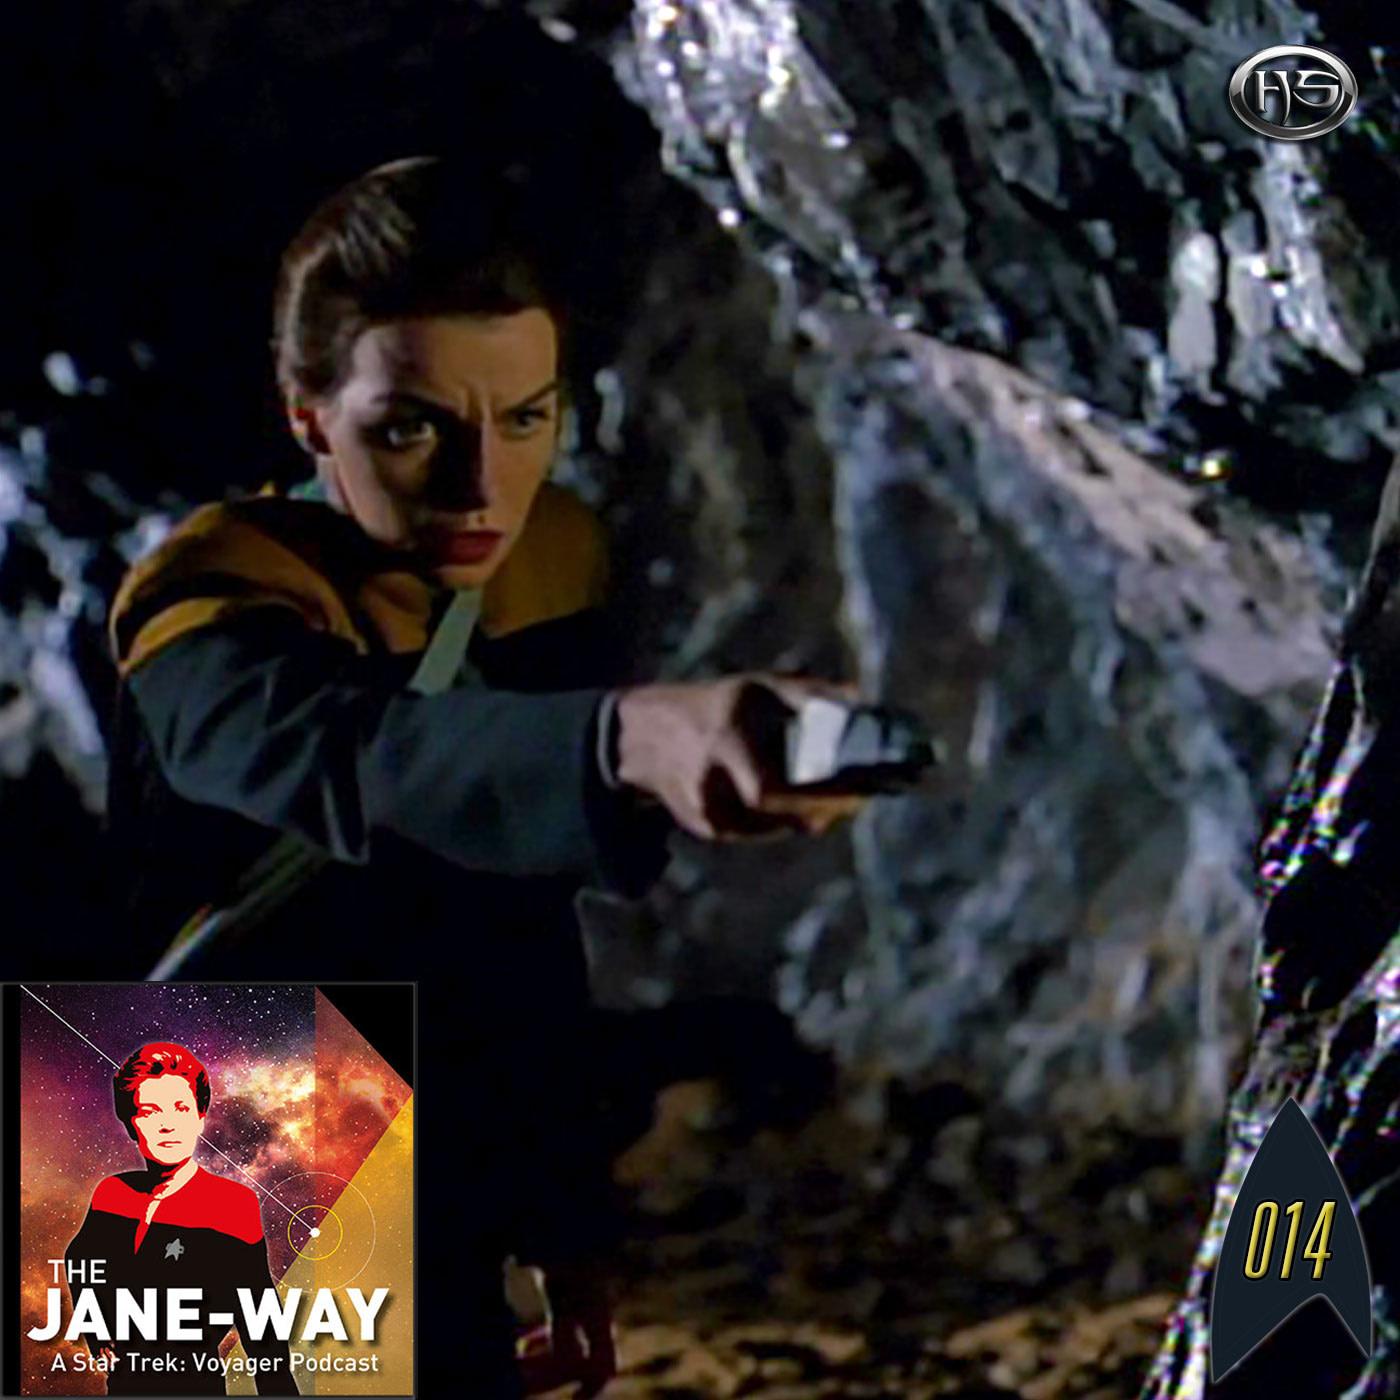 The Jane-Way Episode 14